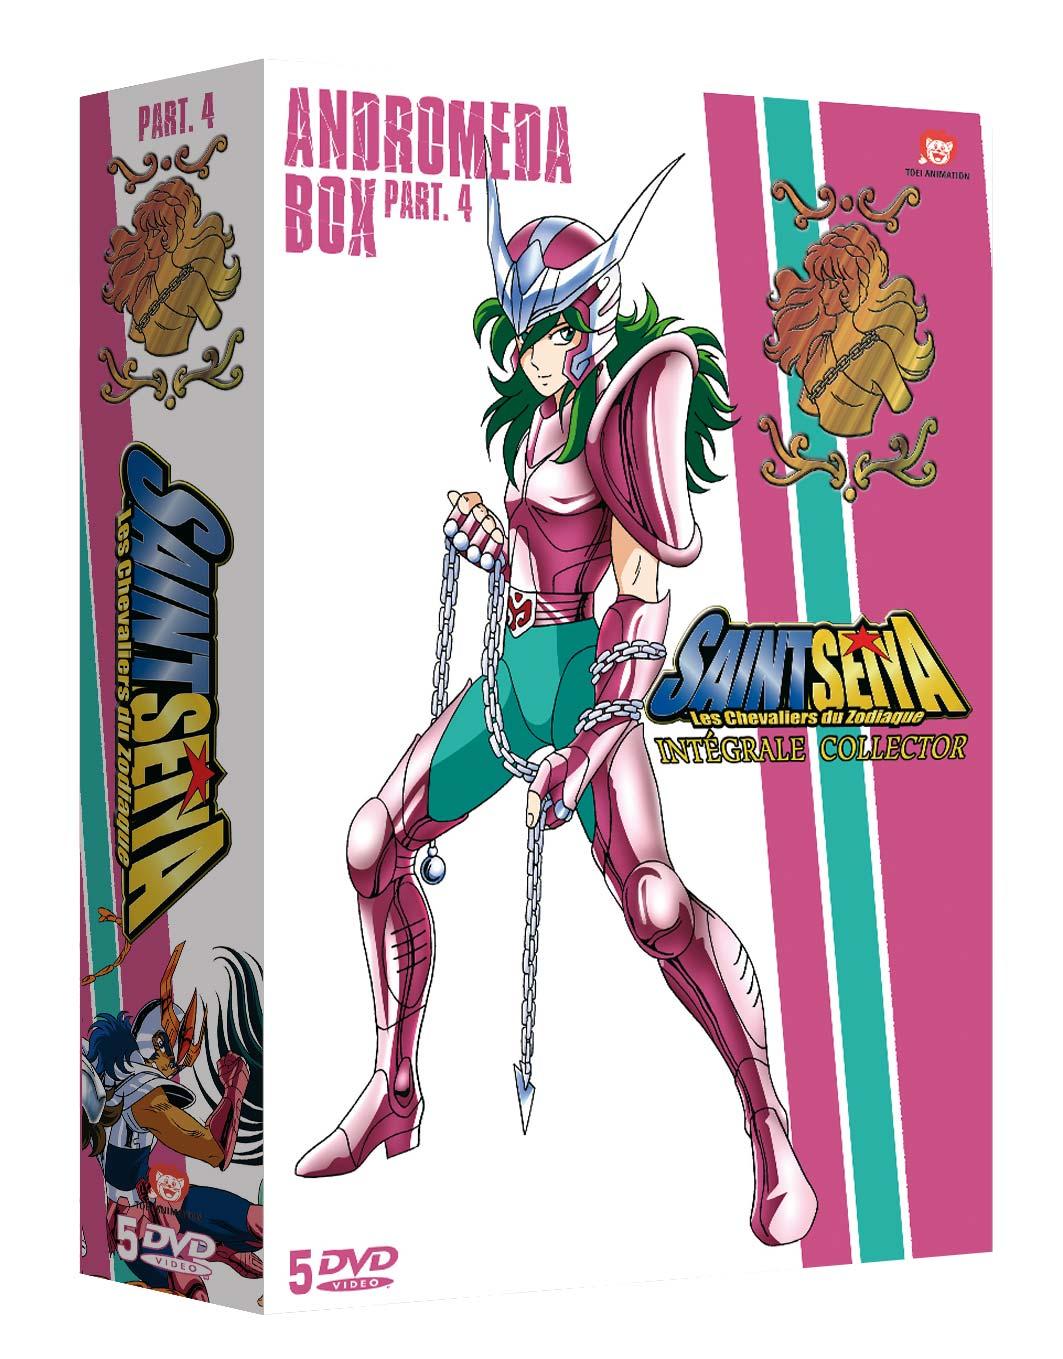 http://www.manga-news.com/public/images/dvd_volumes/CDZcofcollector5DVD04.jpg